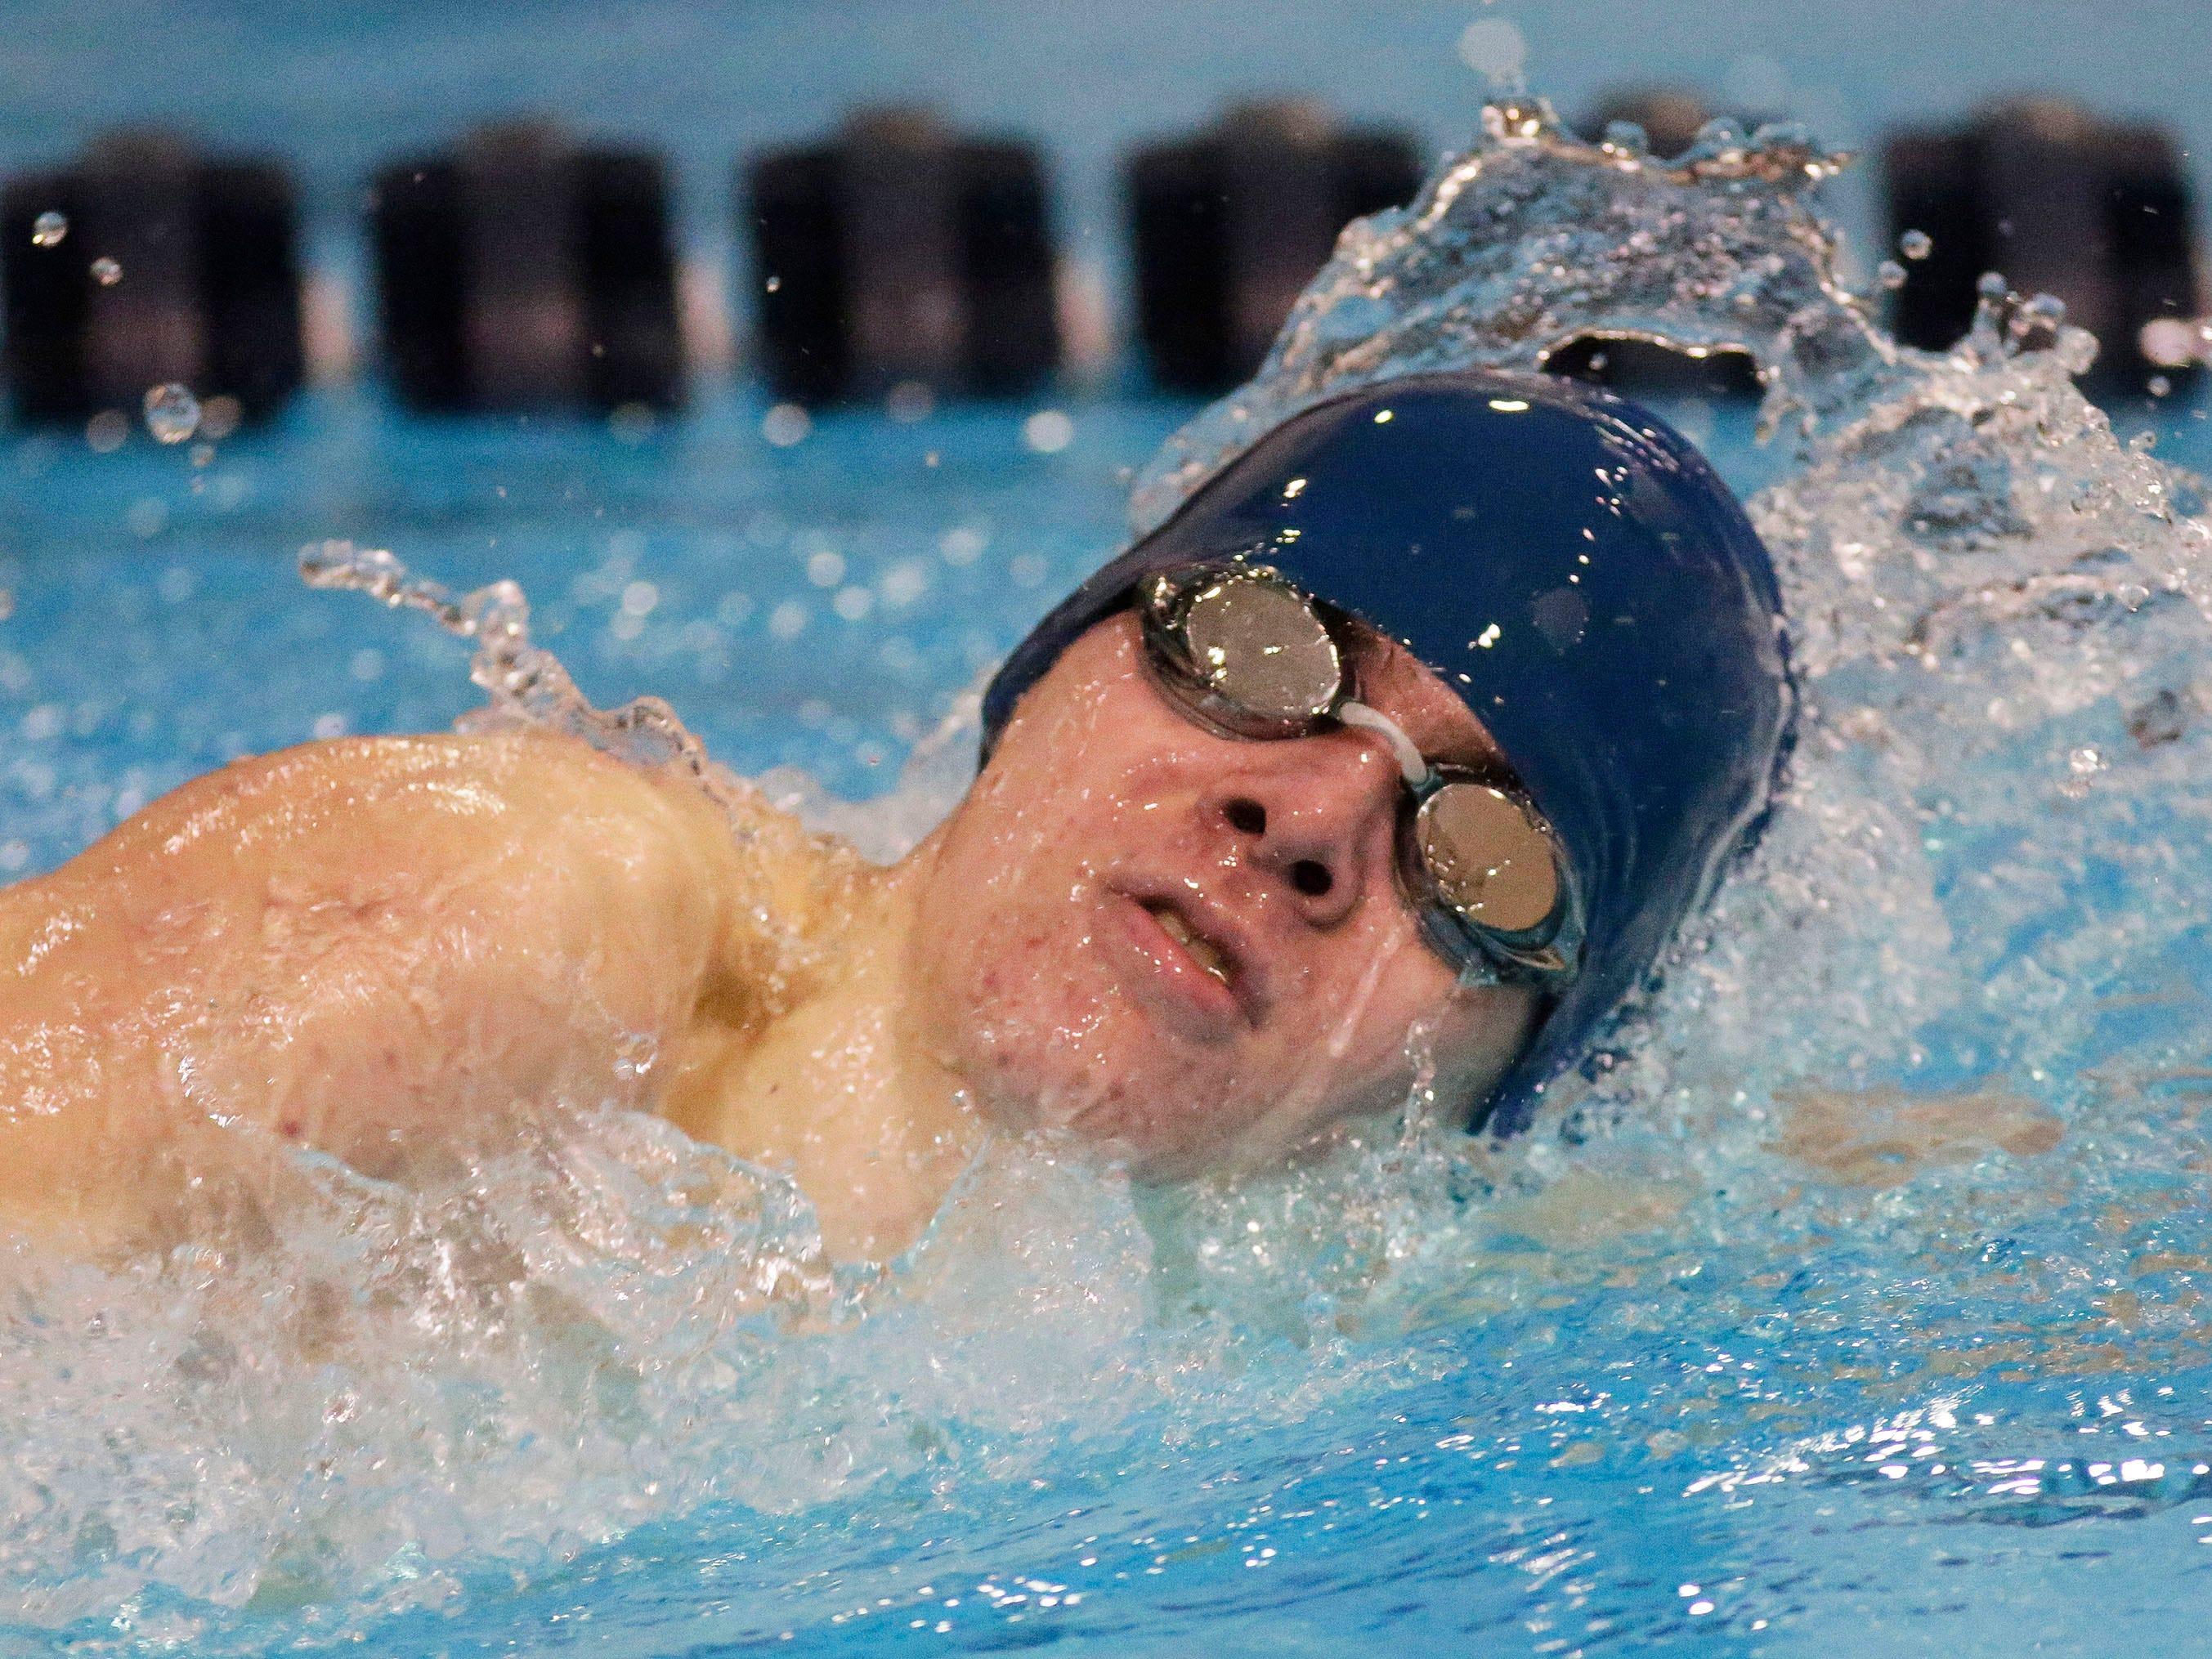 Oshkosh West's Aaron Draxler swims a relay at the Sheboygan North Raiders Relays, Saturday, January 5, 2019, in Sheboygan, Wis.